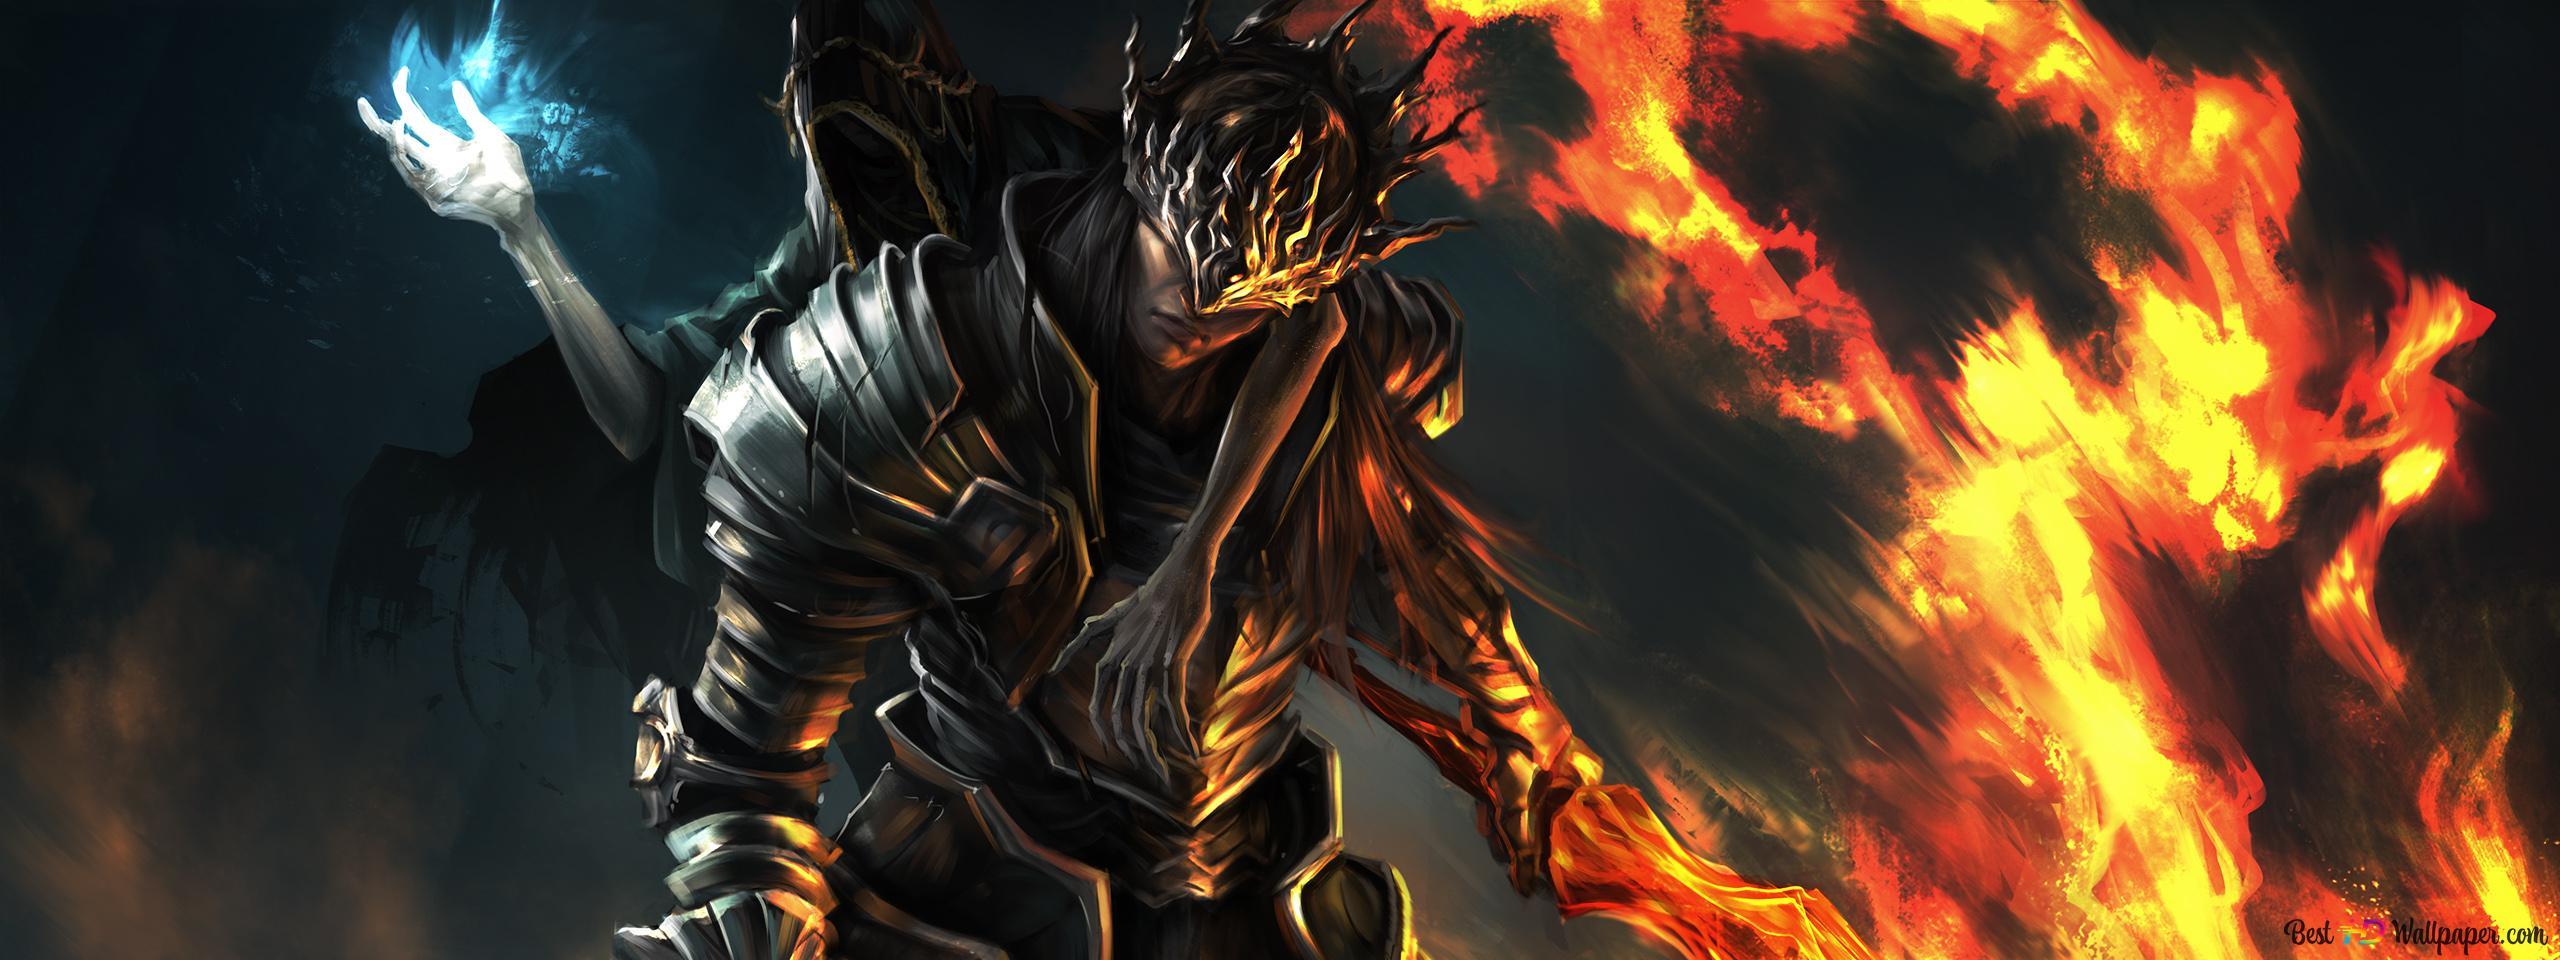 Dark Souls 3 Game Twin Prince Lorian And Lothric Hd Wallpaper